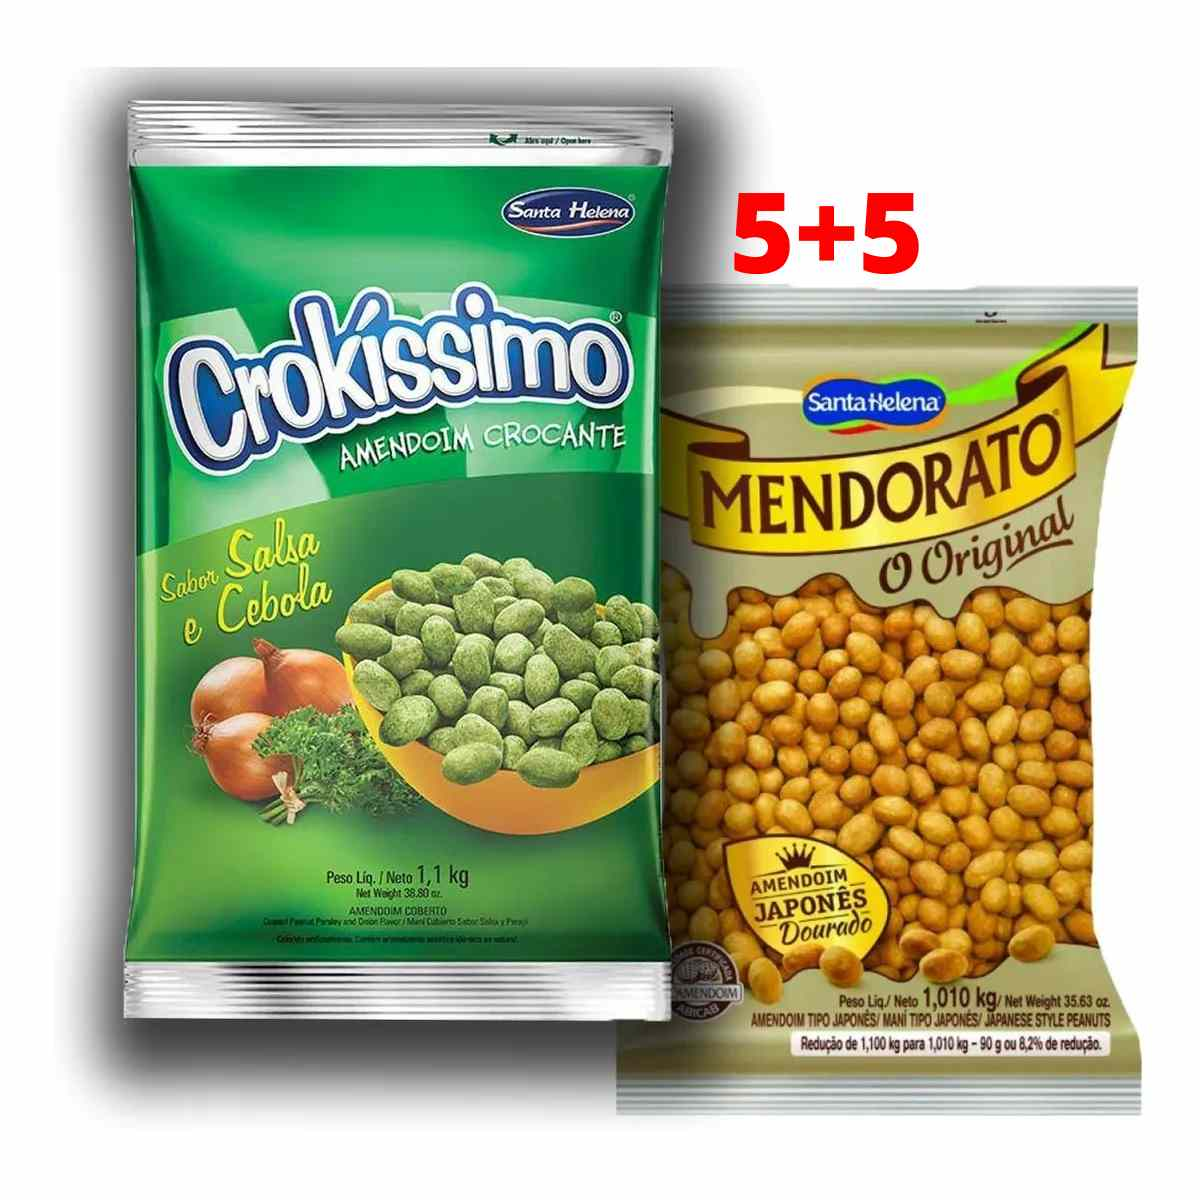 Kit 5 Amendoim Japonês Mendorato E 5 Salsa E Cebola 1,01kg Santa Helena